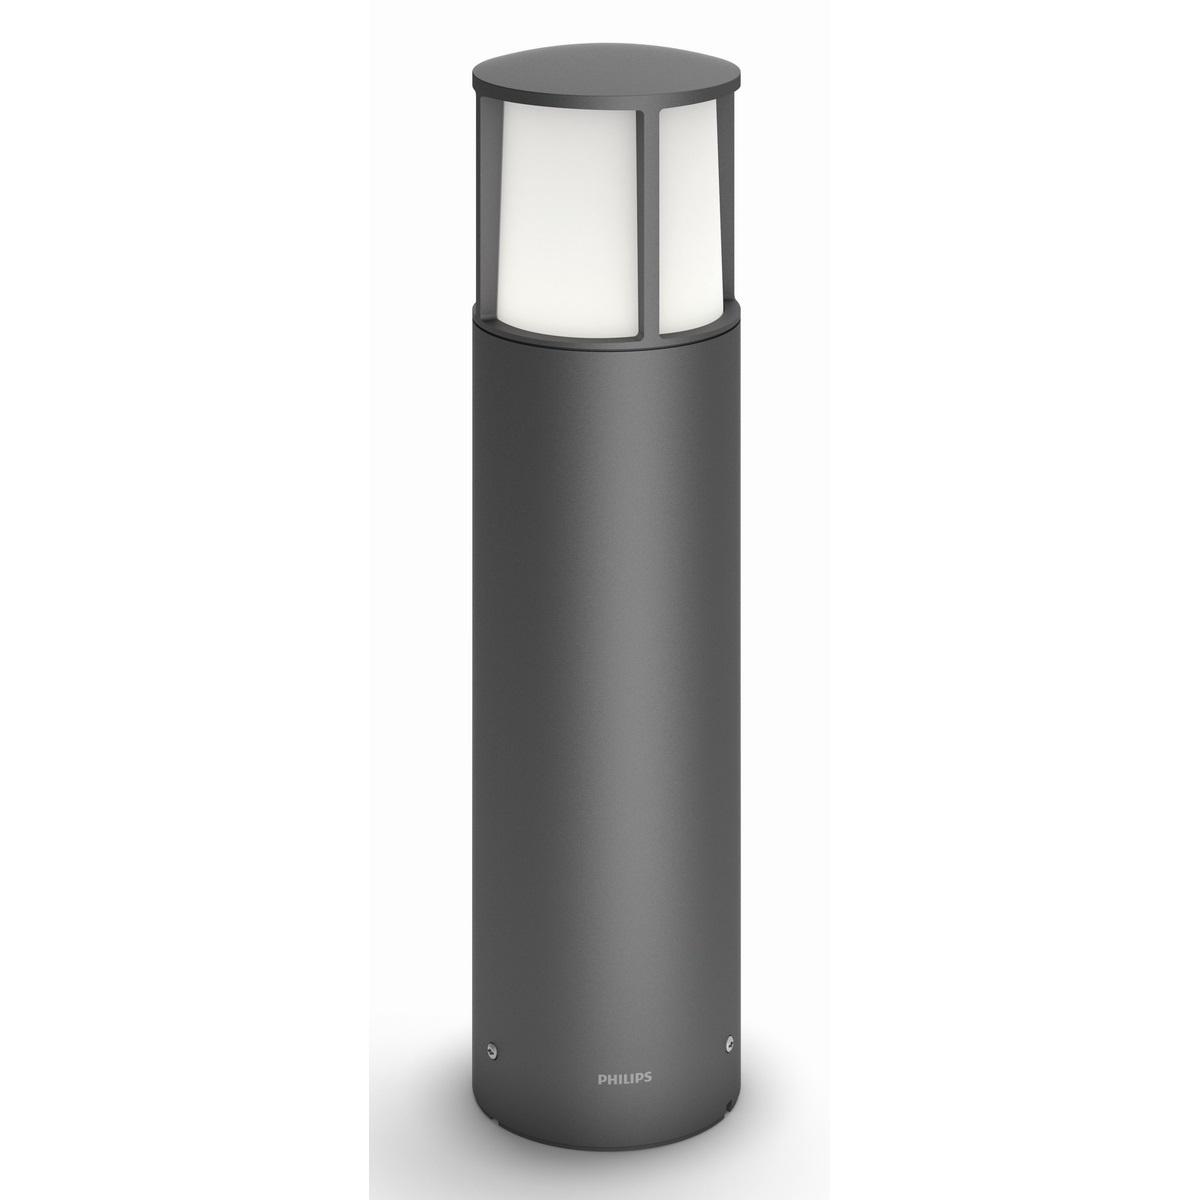 Philips 16466/93/16 Stock Vonkajšie stĺpikové LED svietidlo 40 cm, antracit